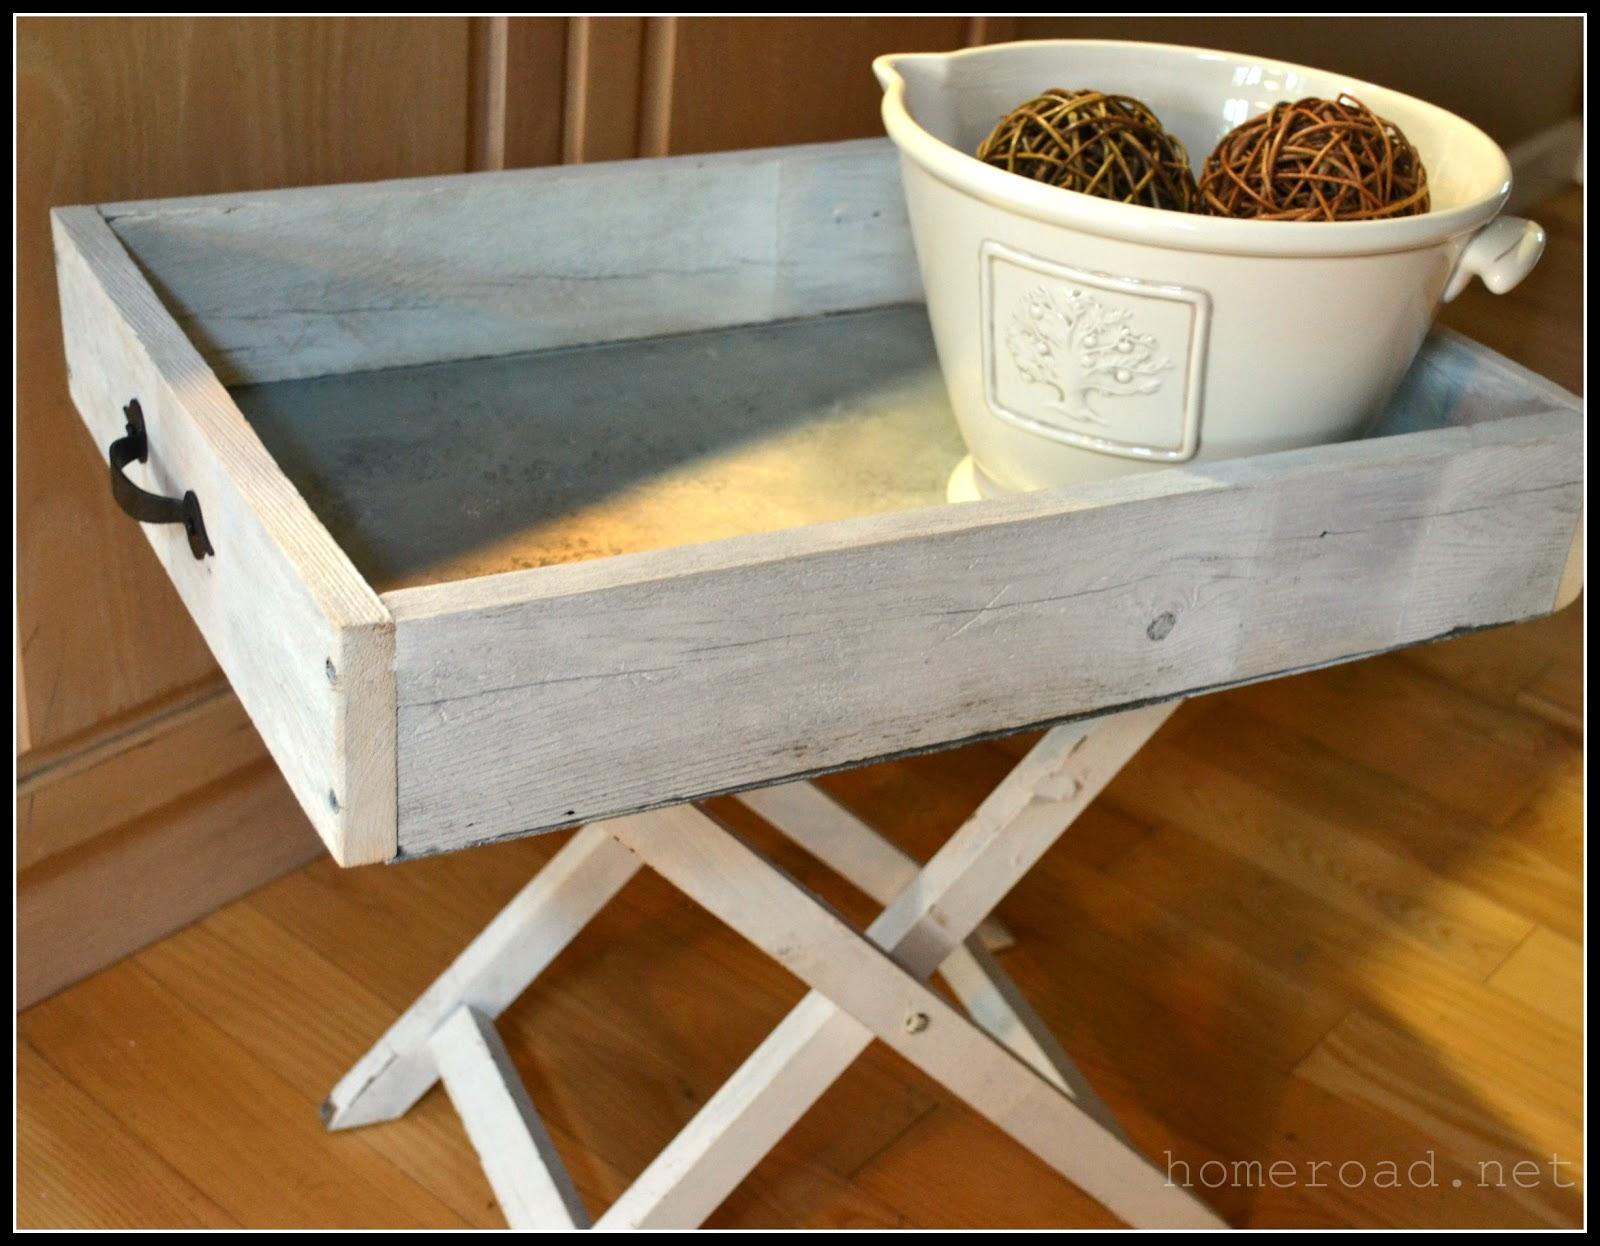 DIY Galvanized Steel Tray | Homeroad